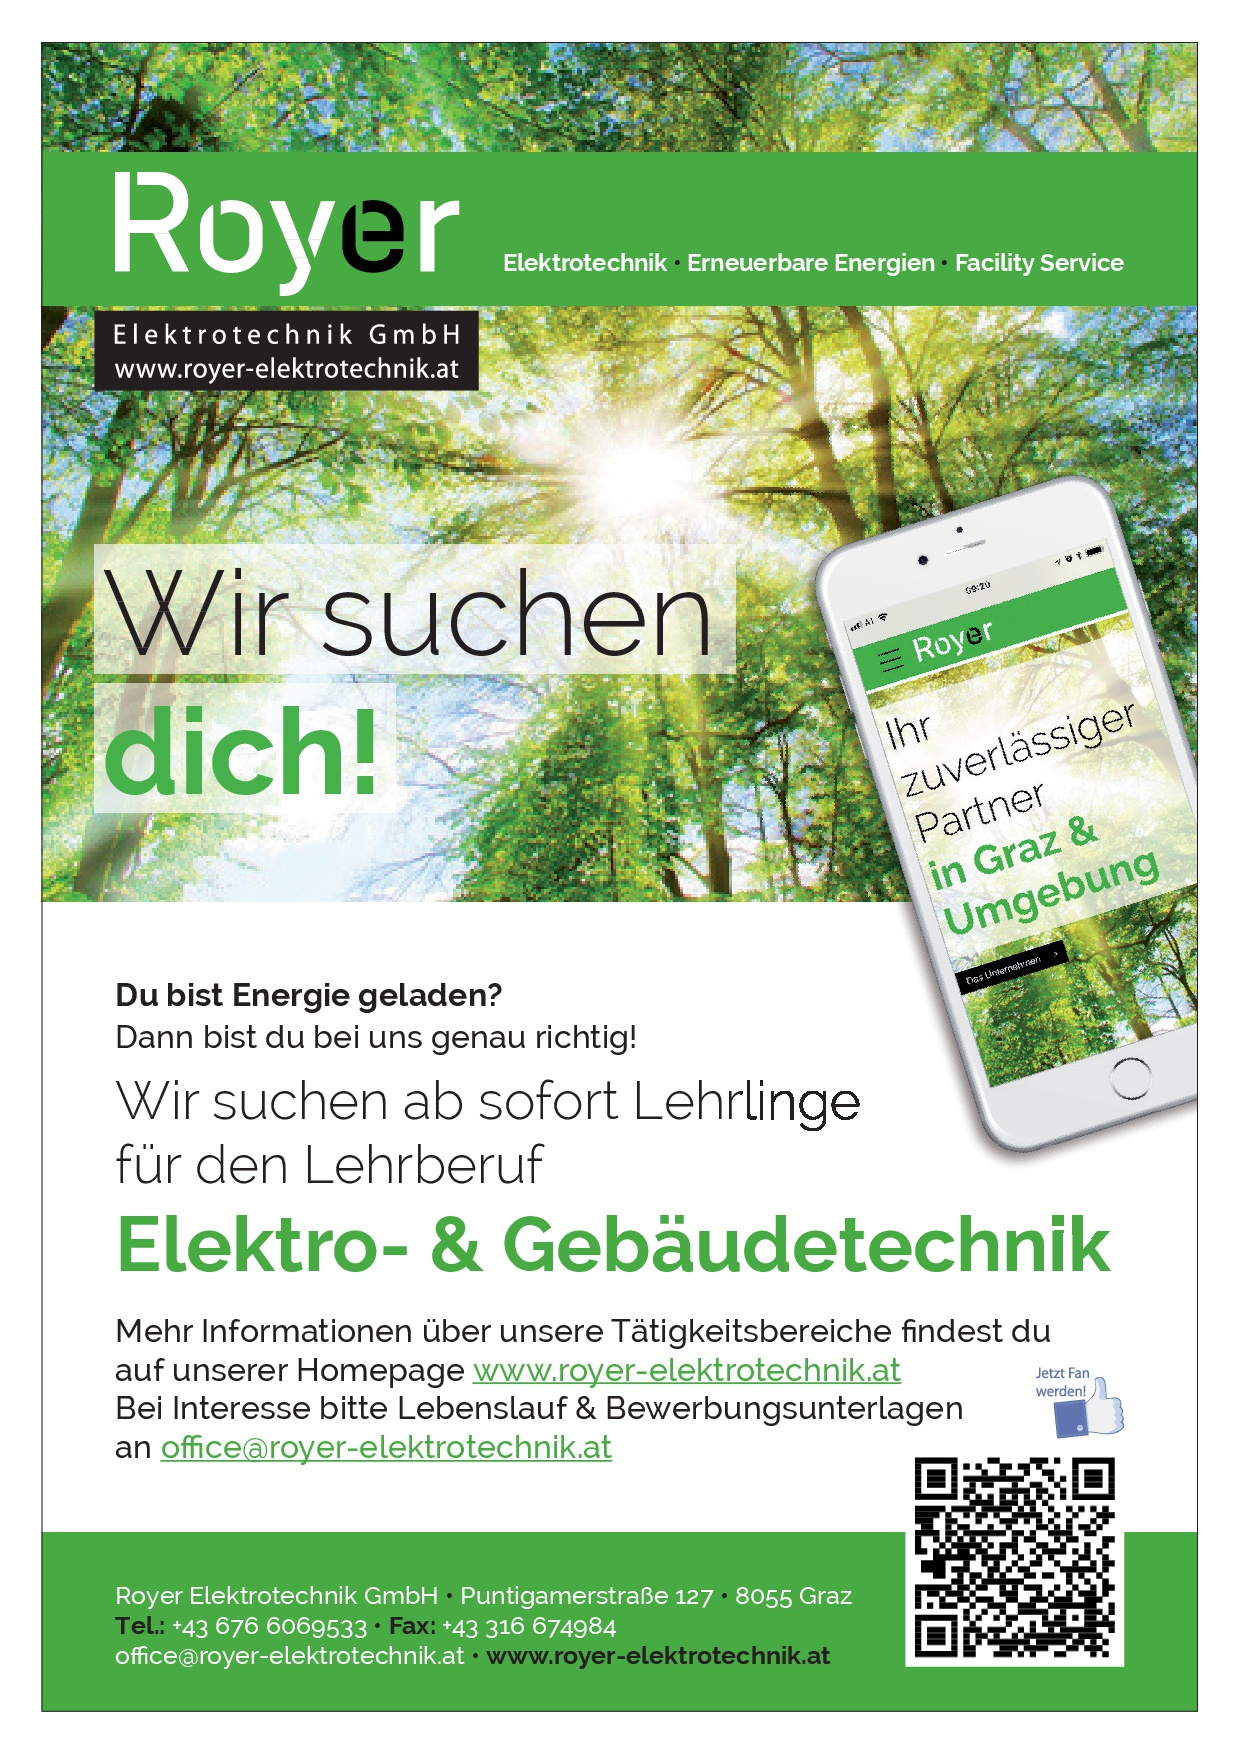 https://www.royer-elektrotechnik.at/wp-content/uploads/2019/01/Royer-Elektrotrechnik_Stellenausschreibung_Lehrling_2018.jpg